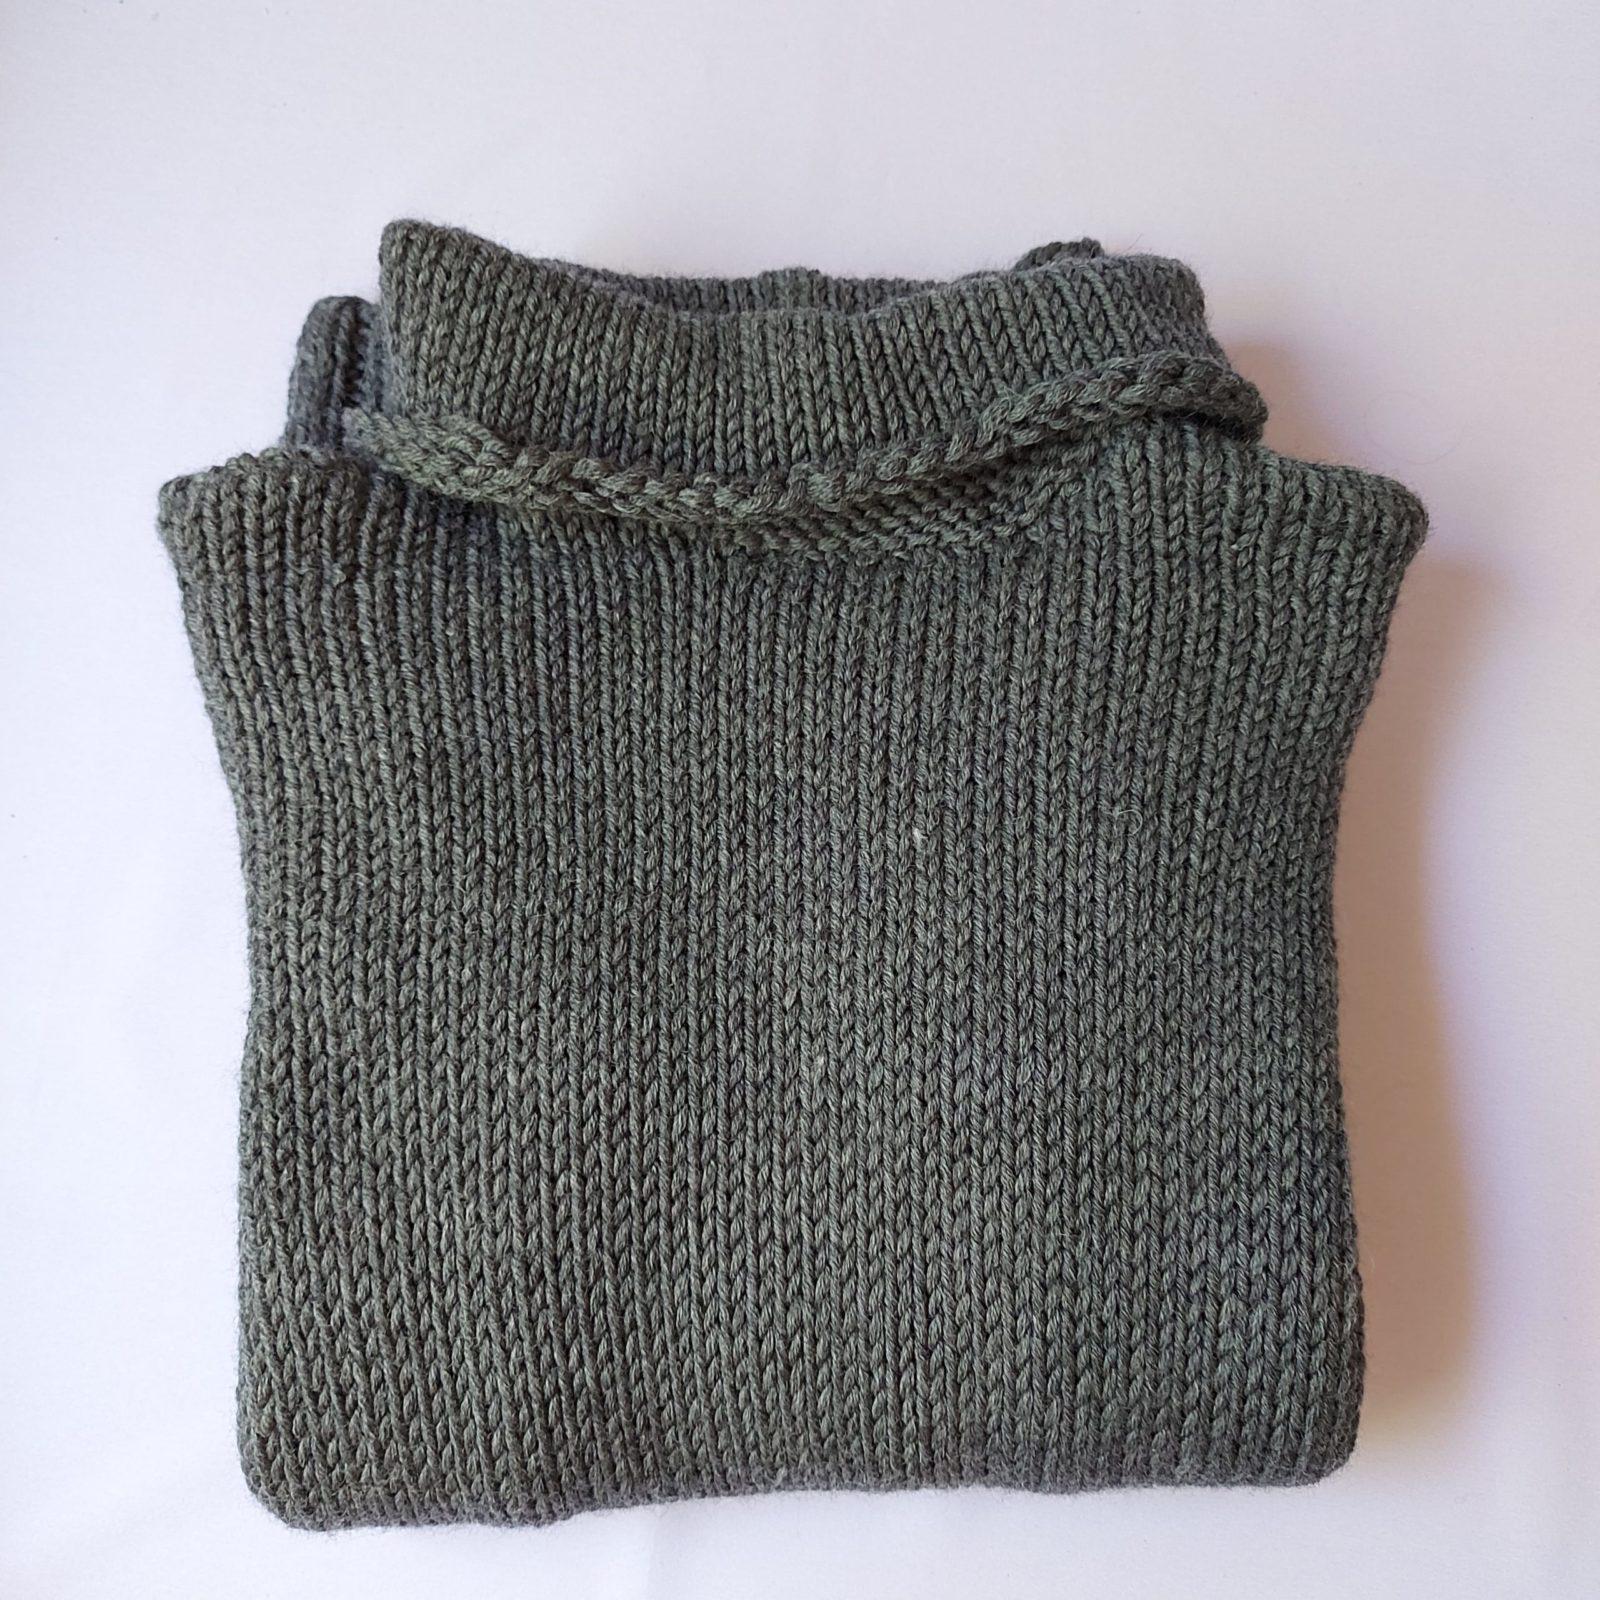 Pull-fait-main-modele-Ga-couleur-gris-1